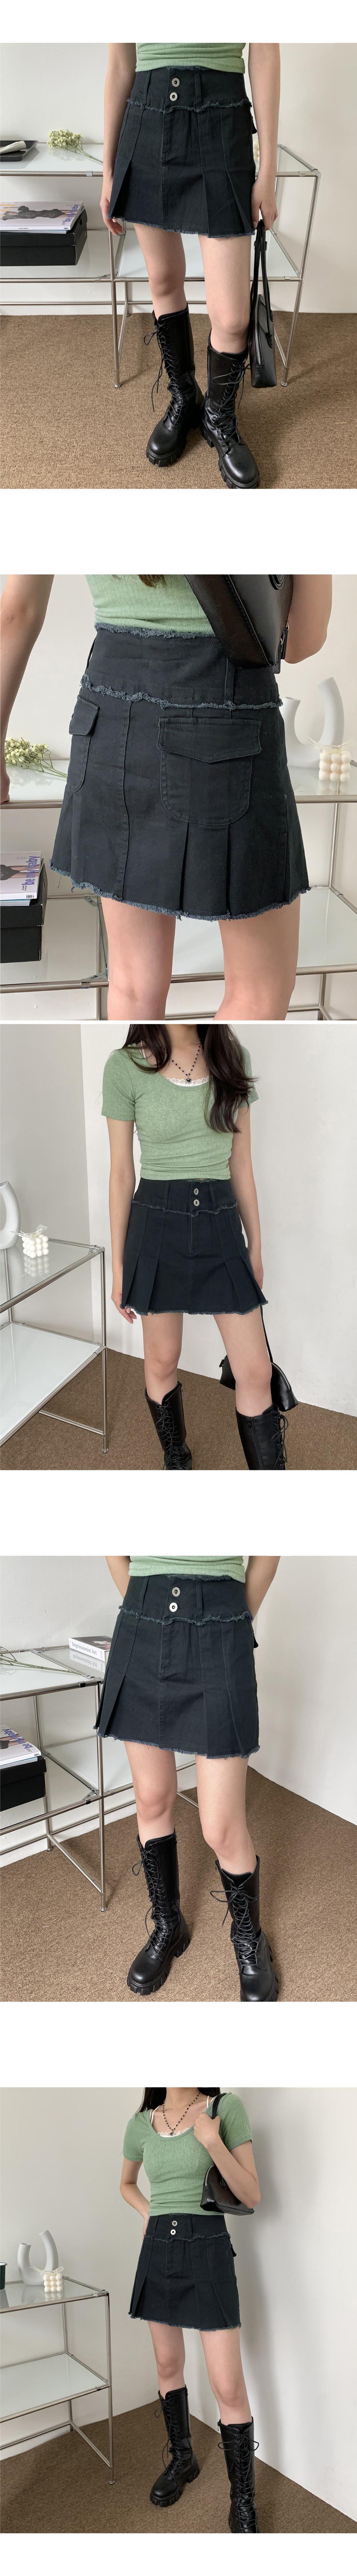 Skirt Teen Surgical Pleated Skirt